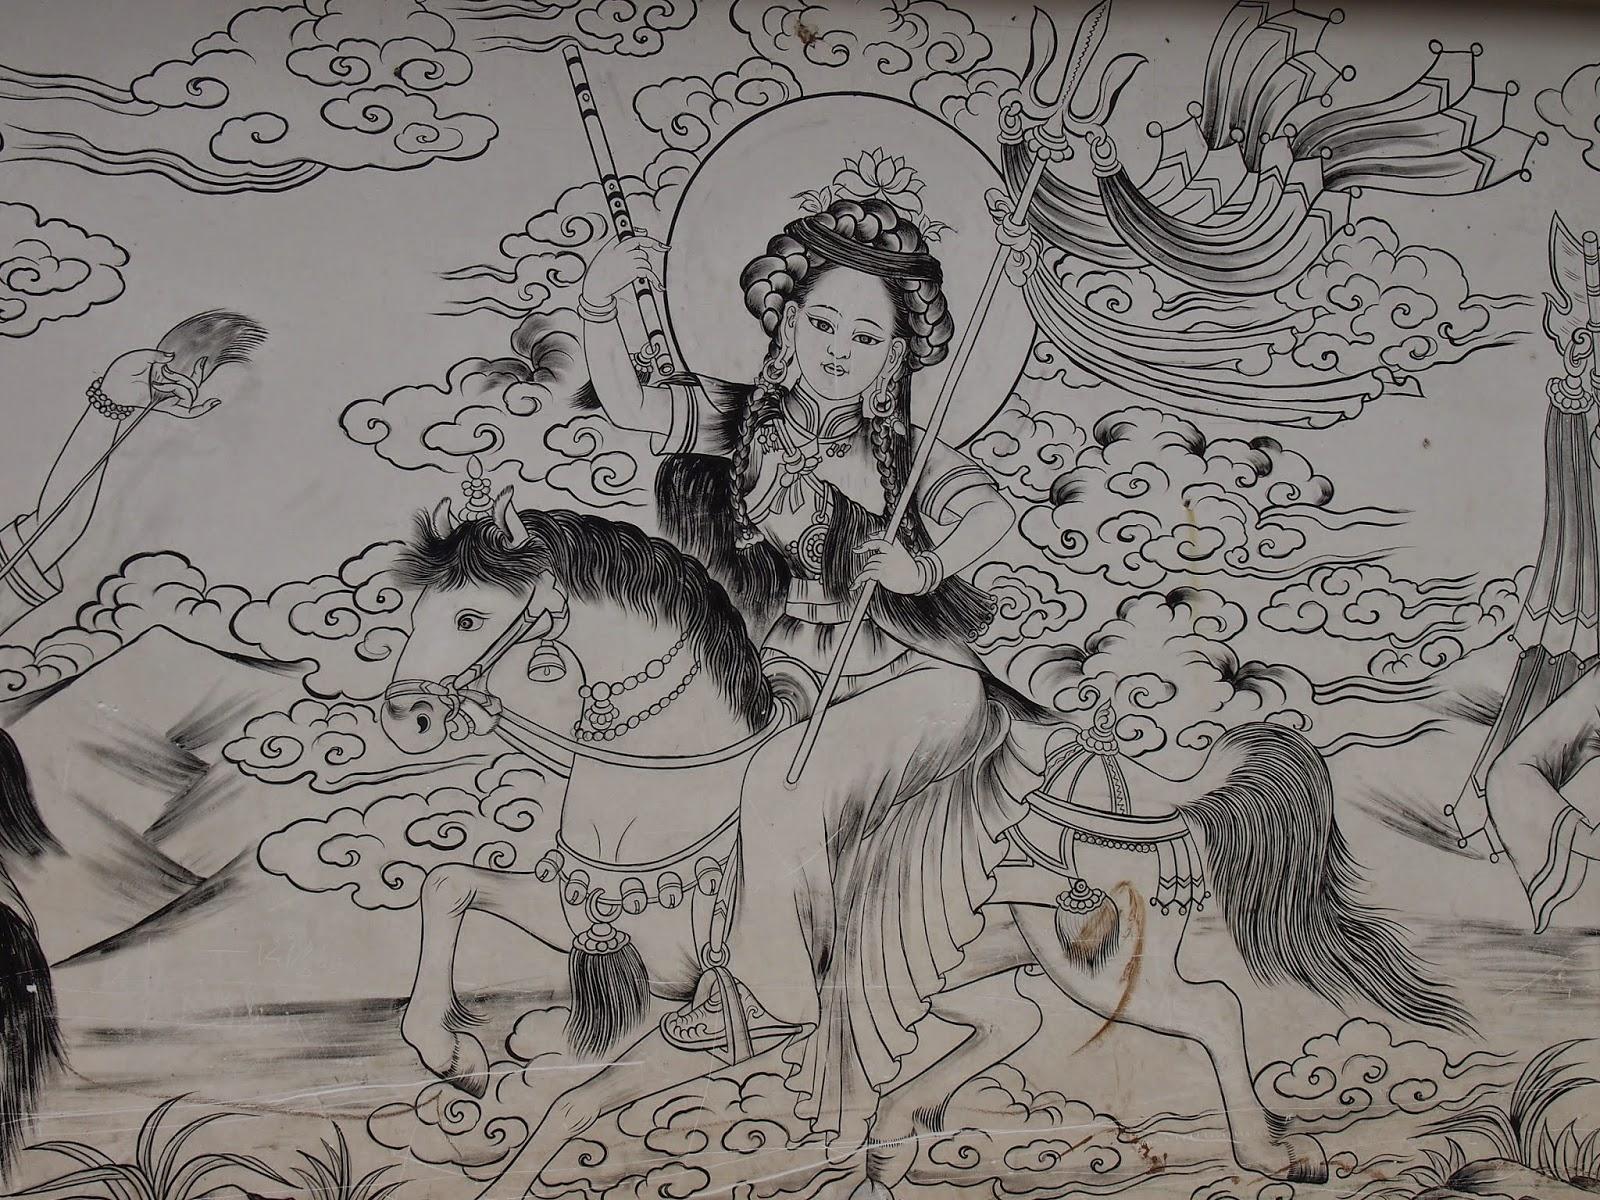 The Gemu Goddess